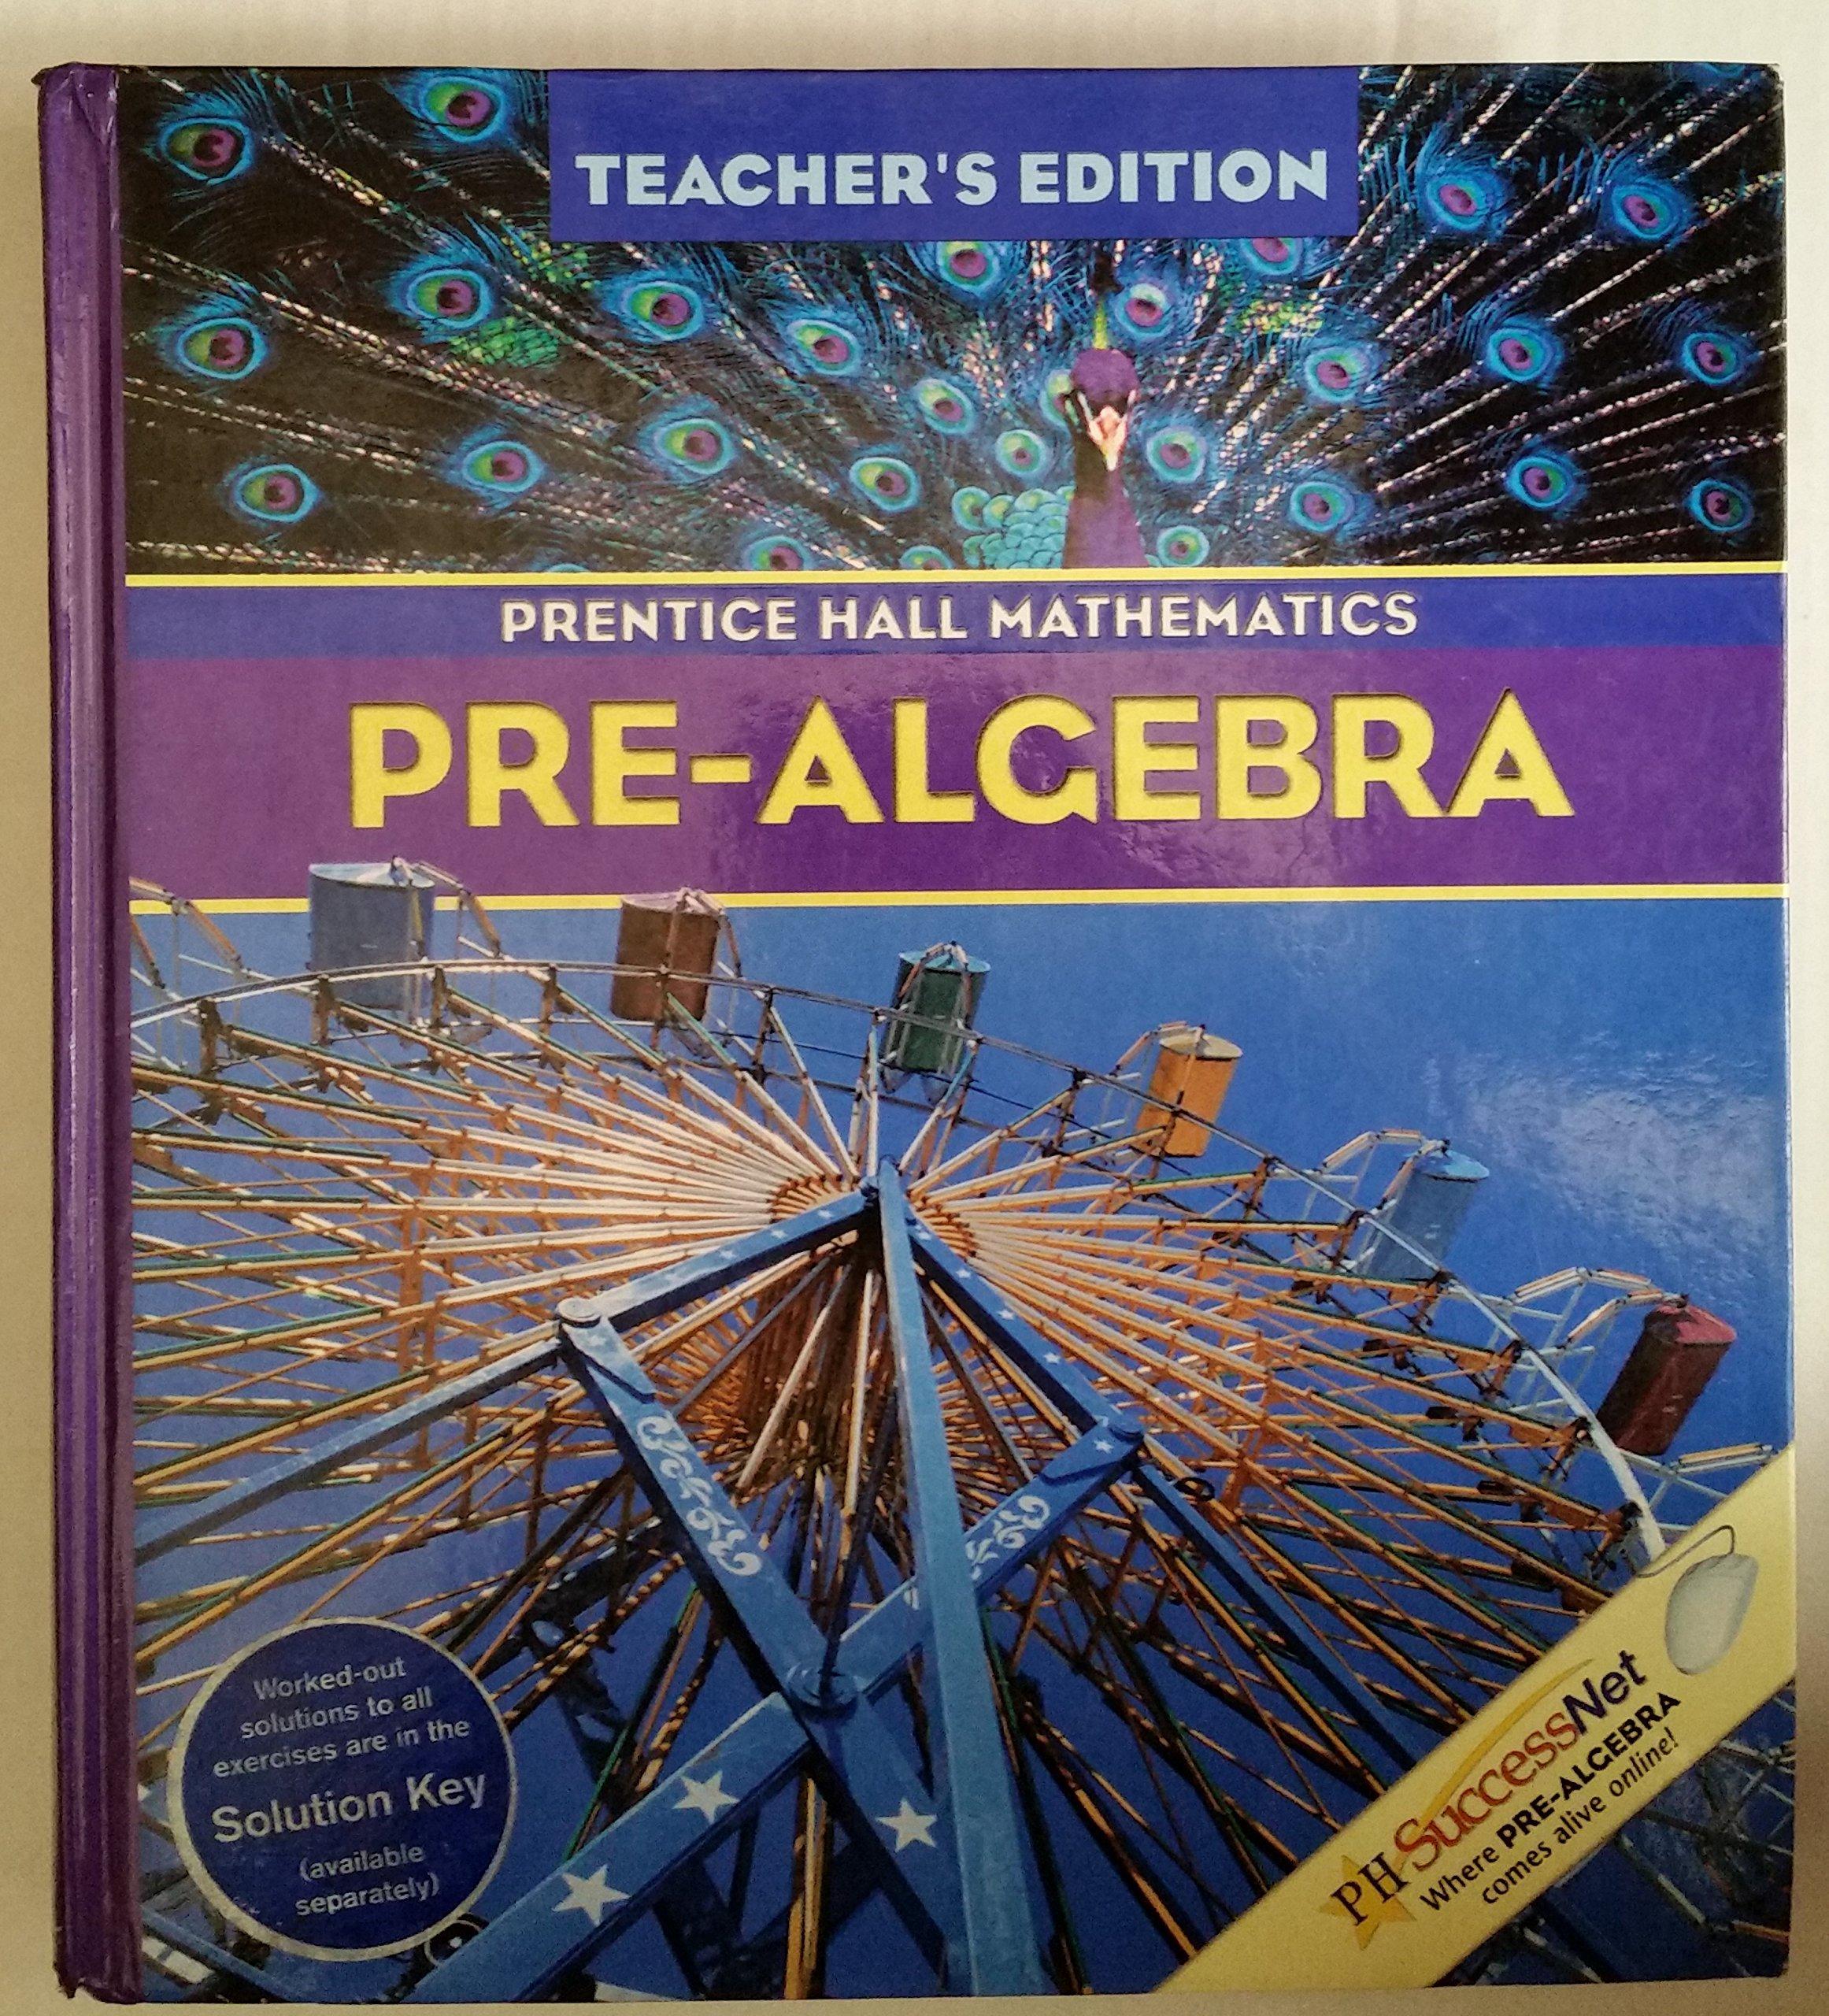 Prentice Hall Mathematics: Pre-Algebra, Teacher's Edition PDF